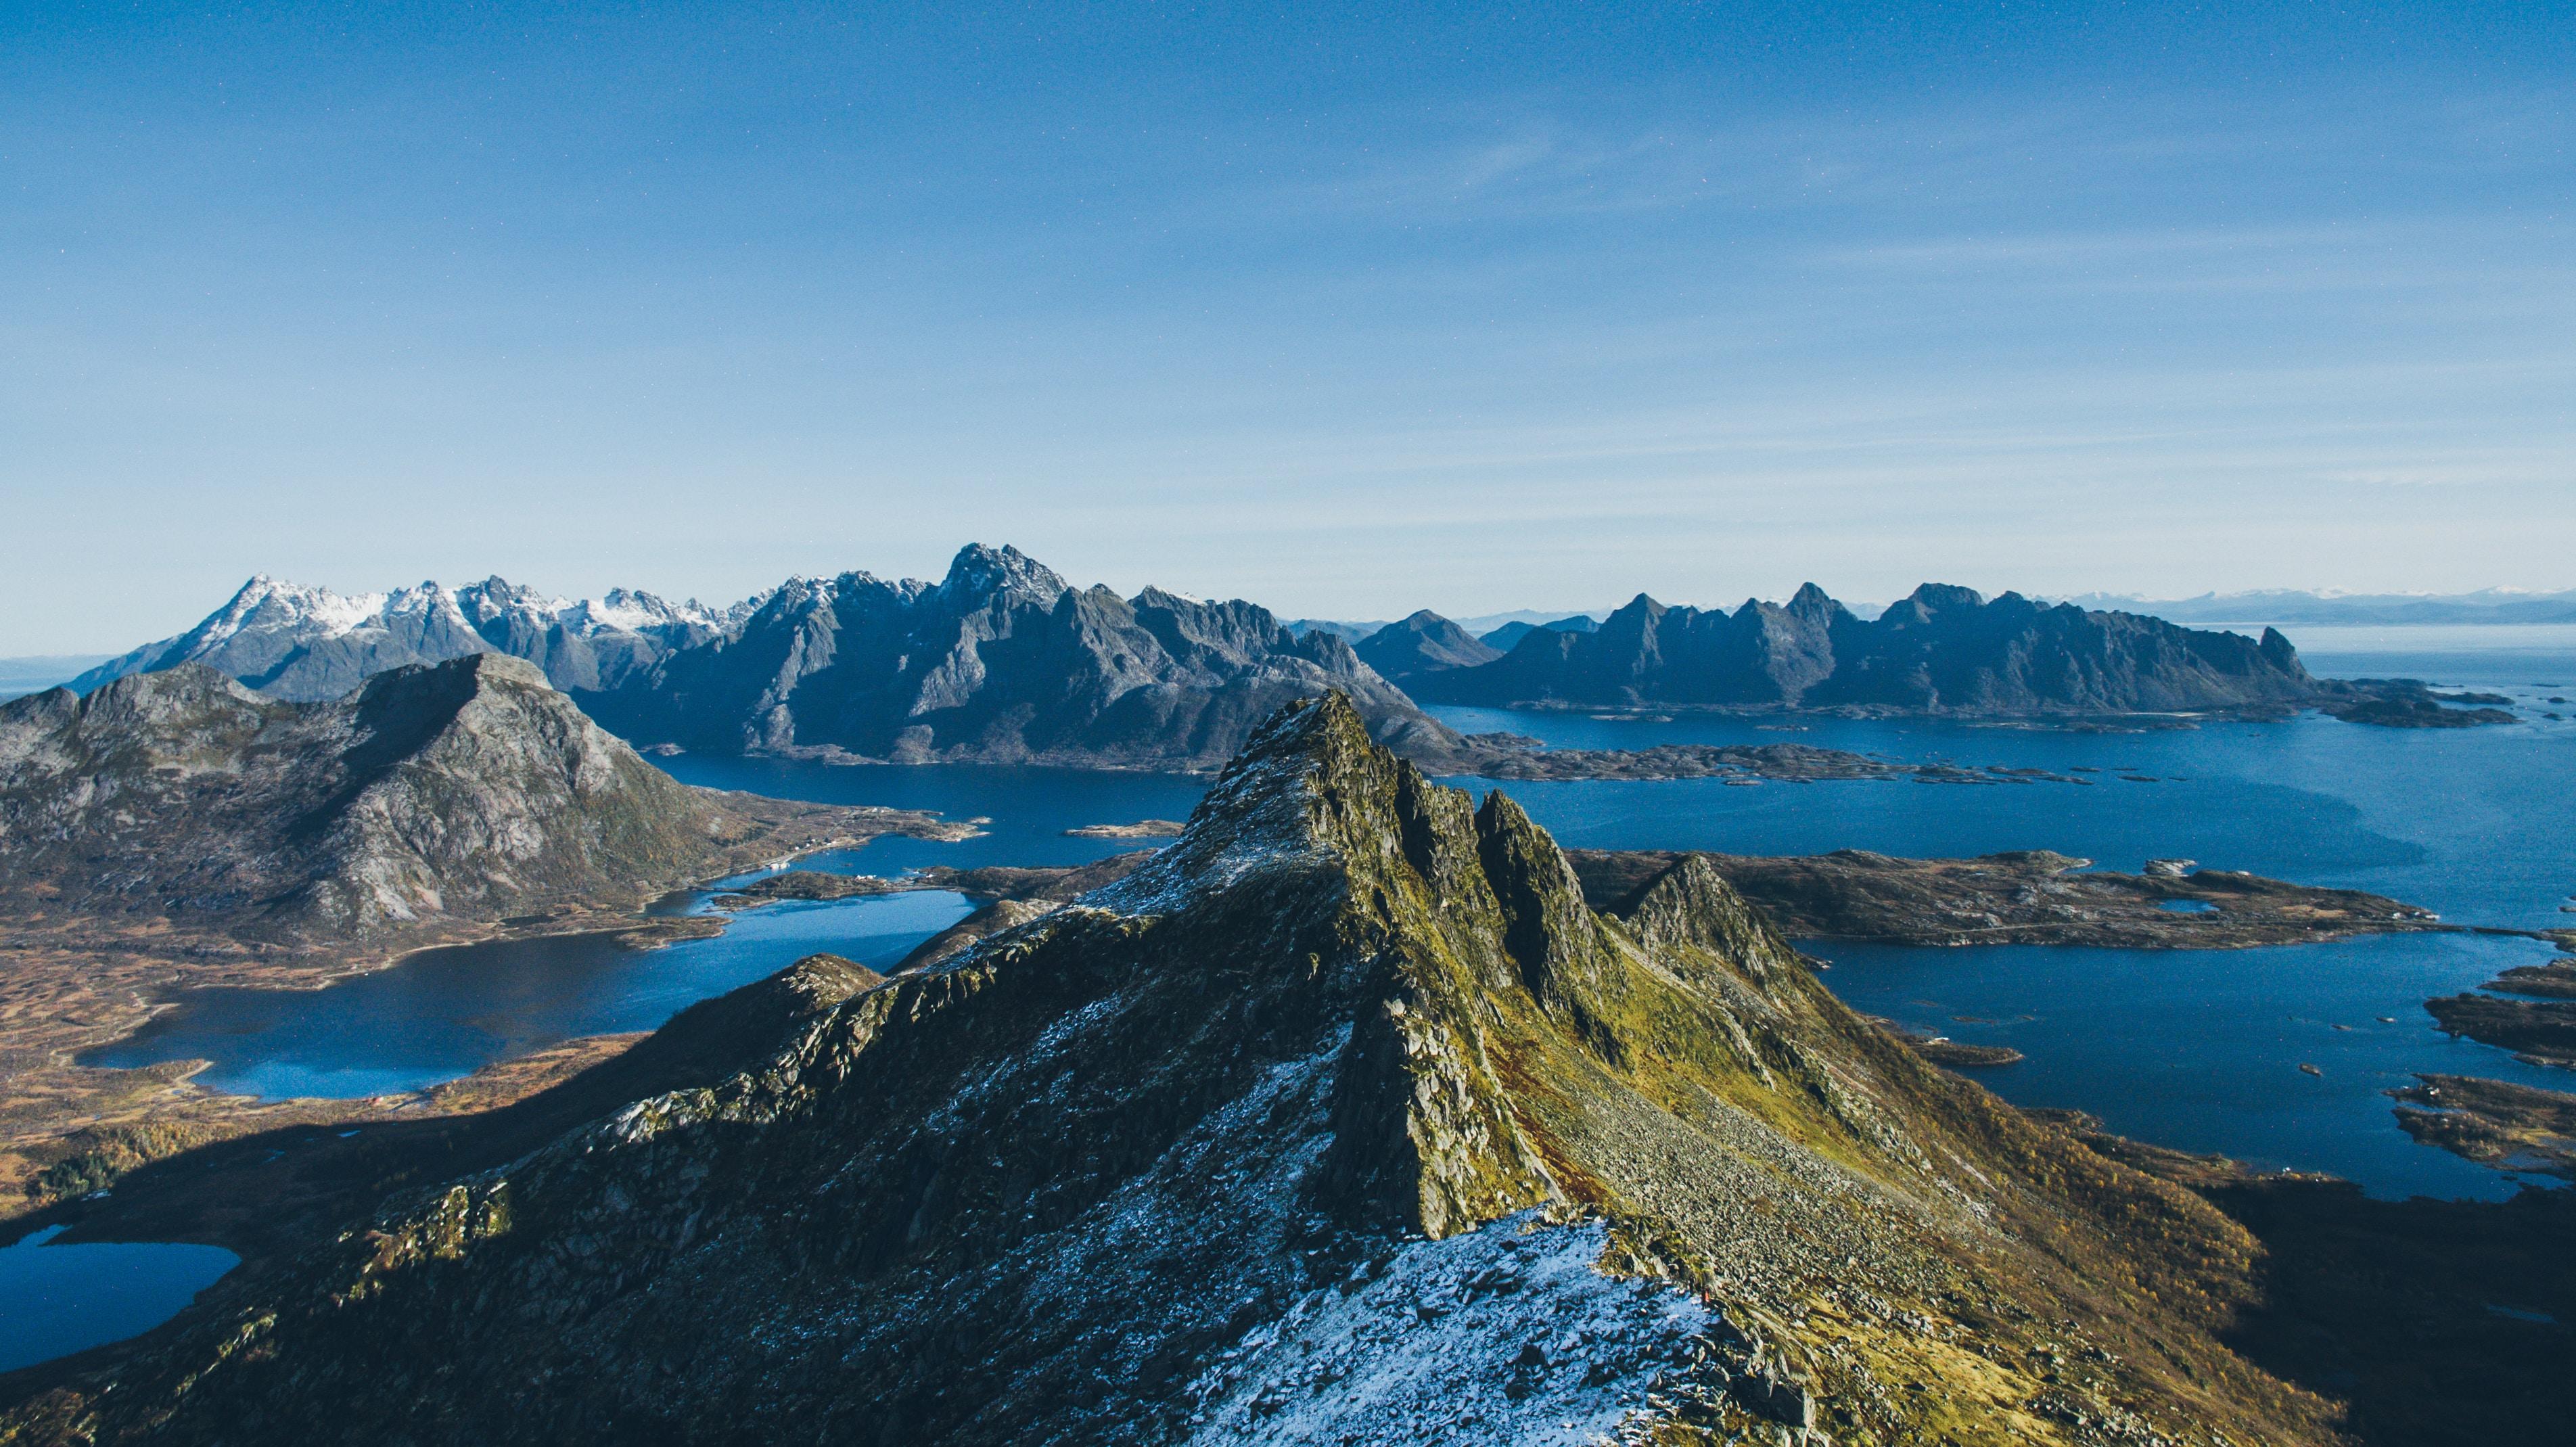 landscape photo of mountains